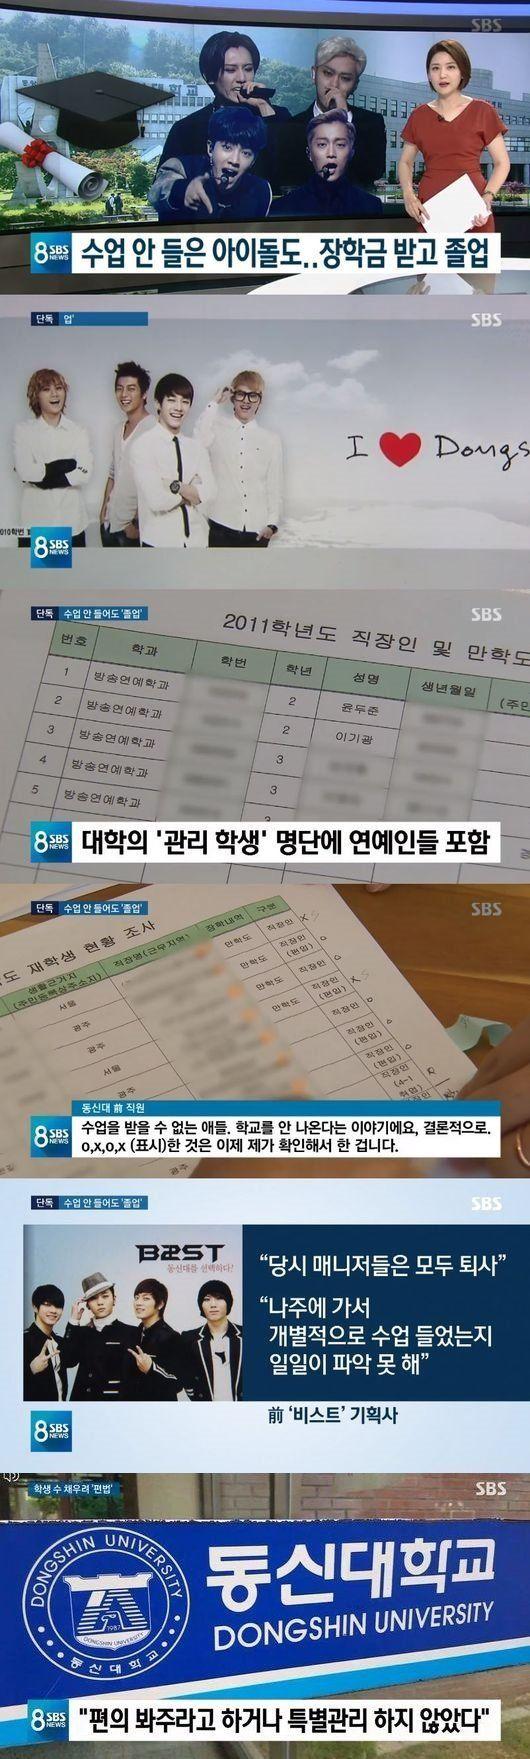 "[Oh!쎈 초점] 하이라이트 측 ""前 비스트, 입학과정 부정 無"" 적극 해명..대학 특혜논란"